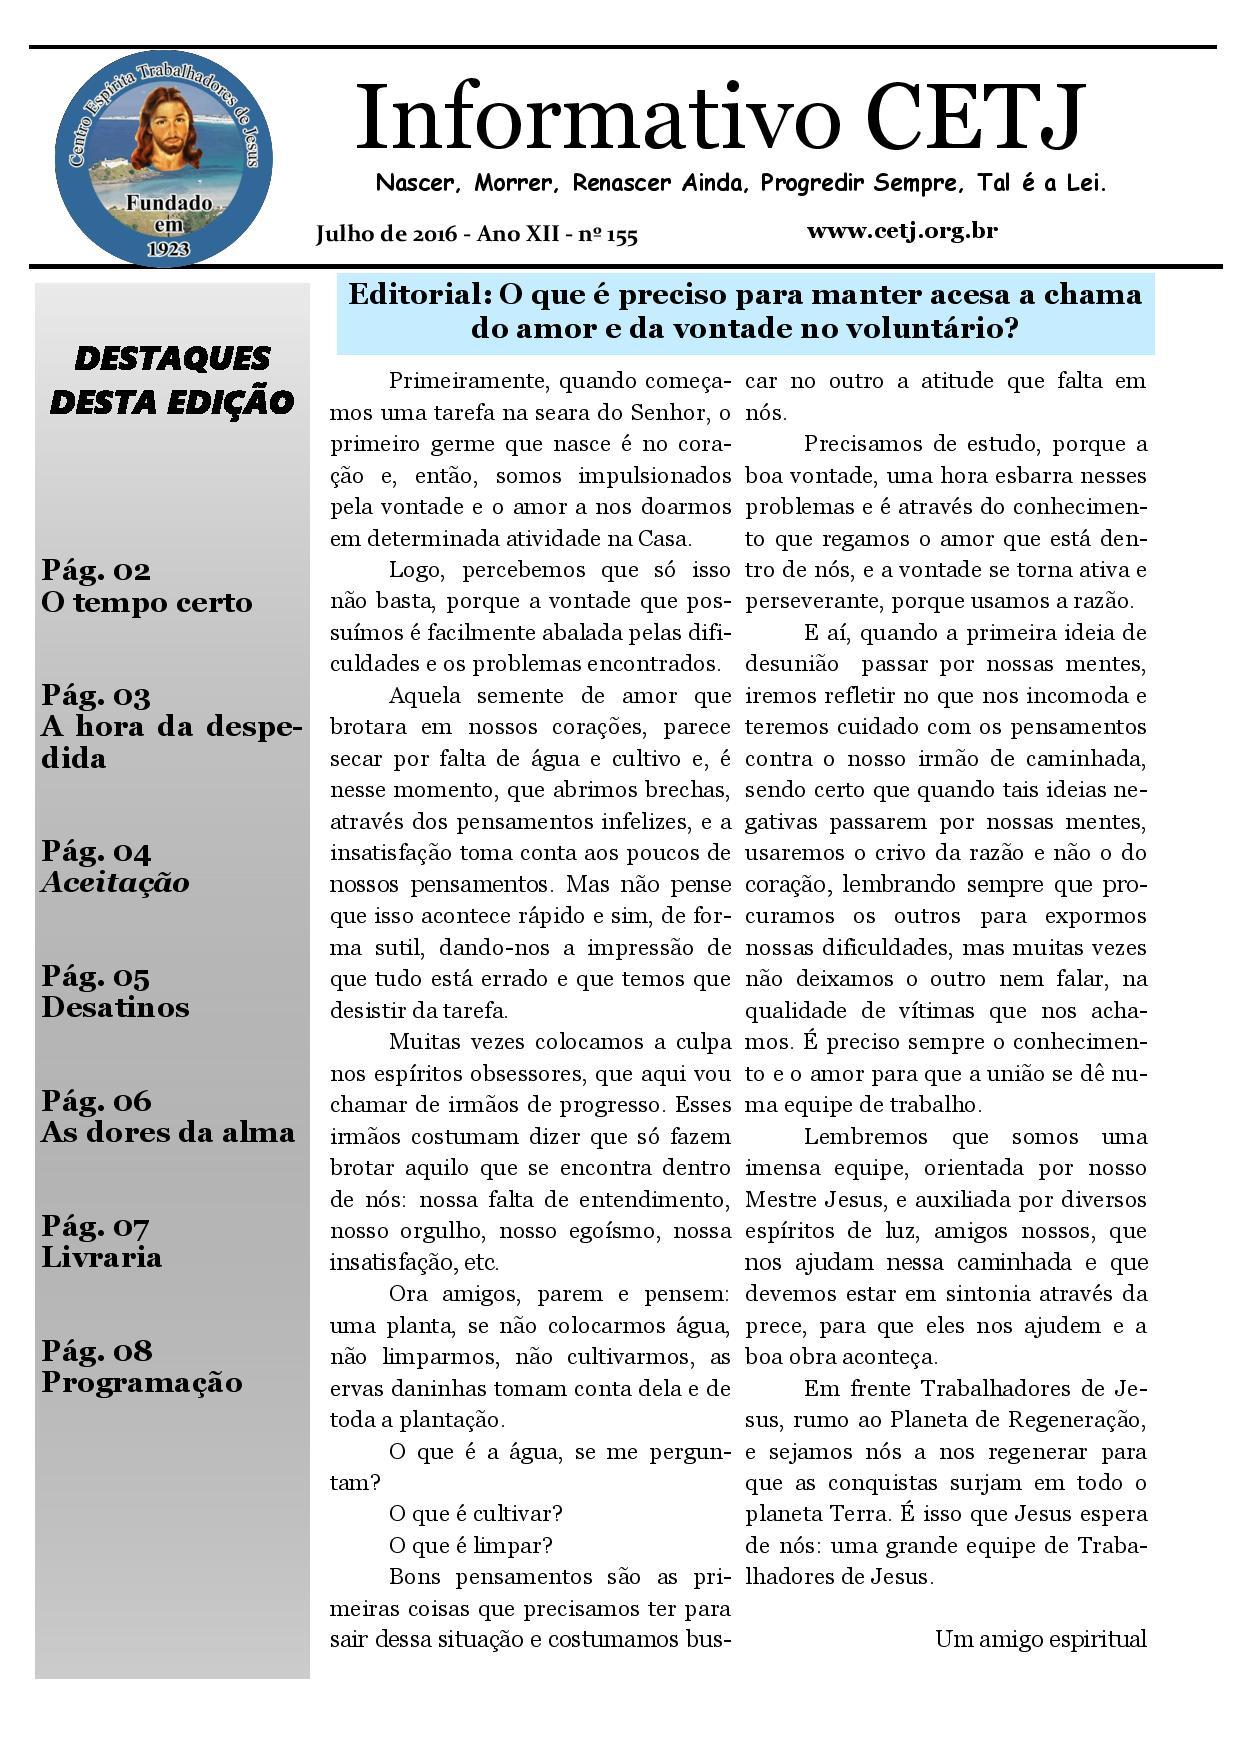 Informativo julho de 2016_net-page-001